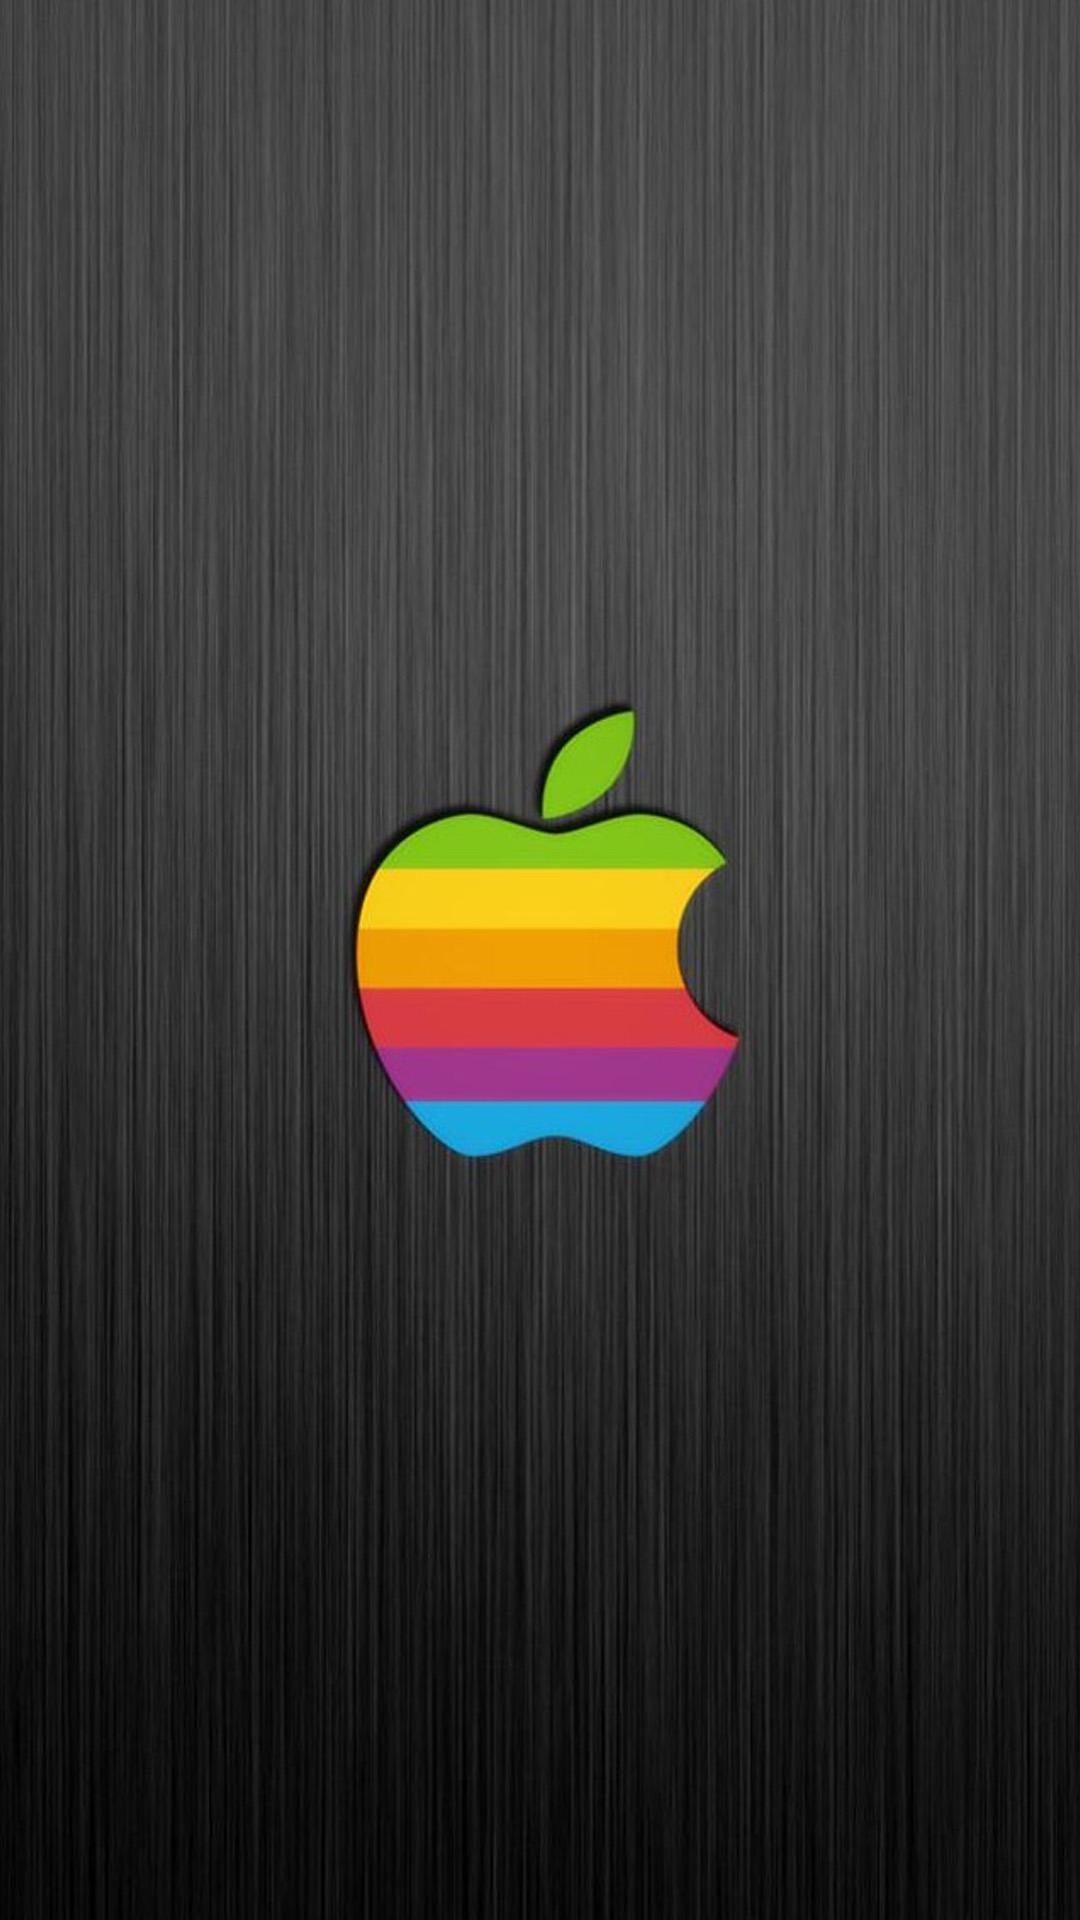 Apple iPhone 6 Plus Wallpaper 02 iPhone 6 Plus Wallpapers HD 1080x1920